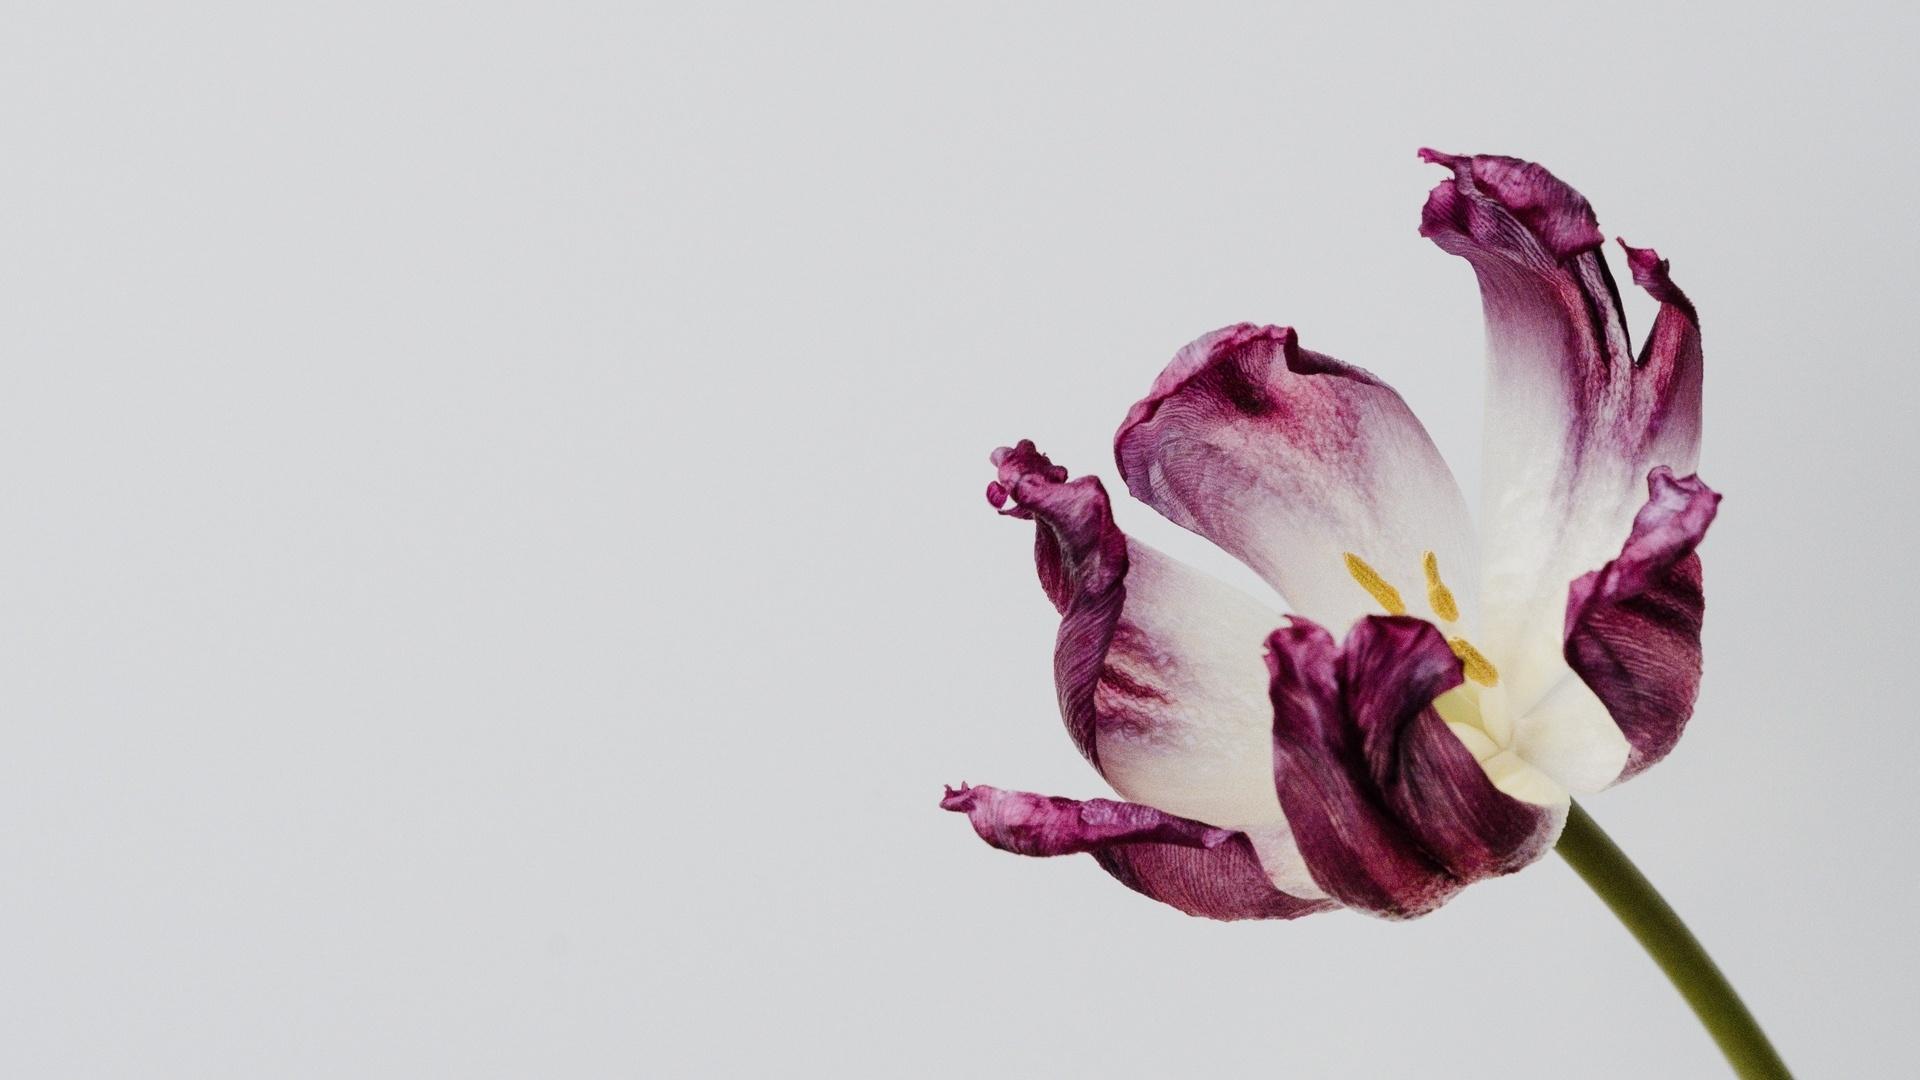 Tulip Minimalist Desktop Wallpaper